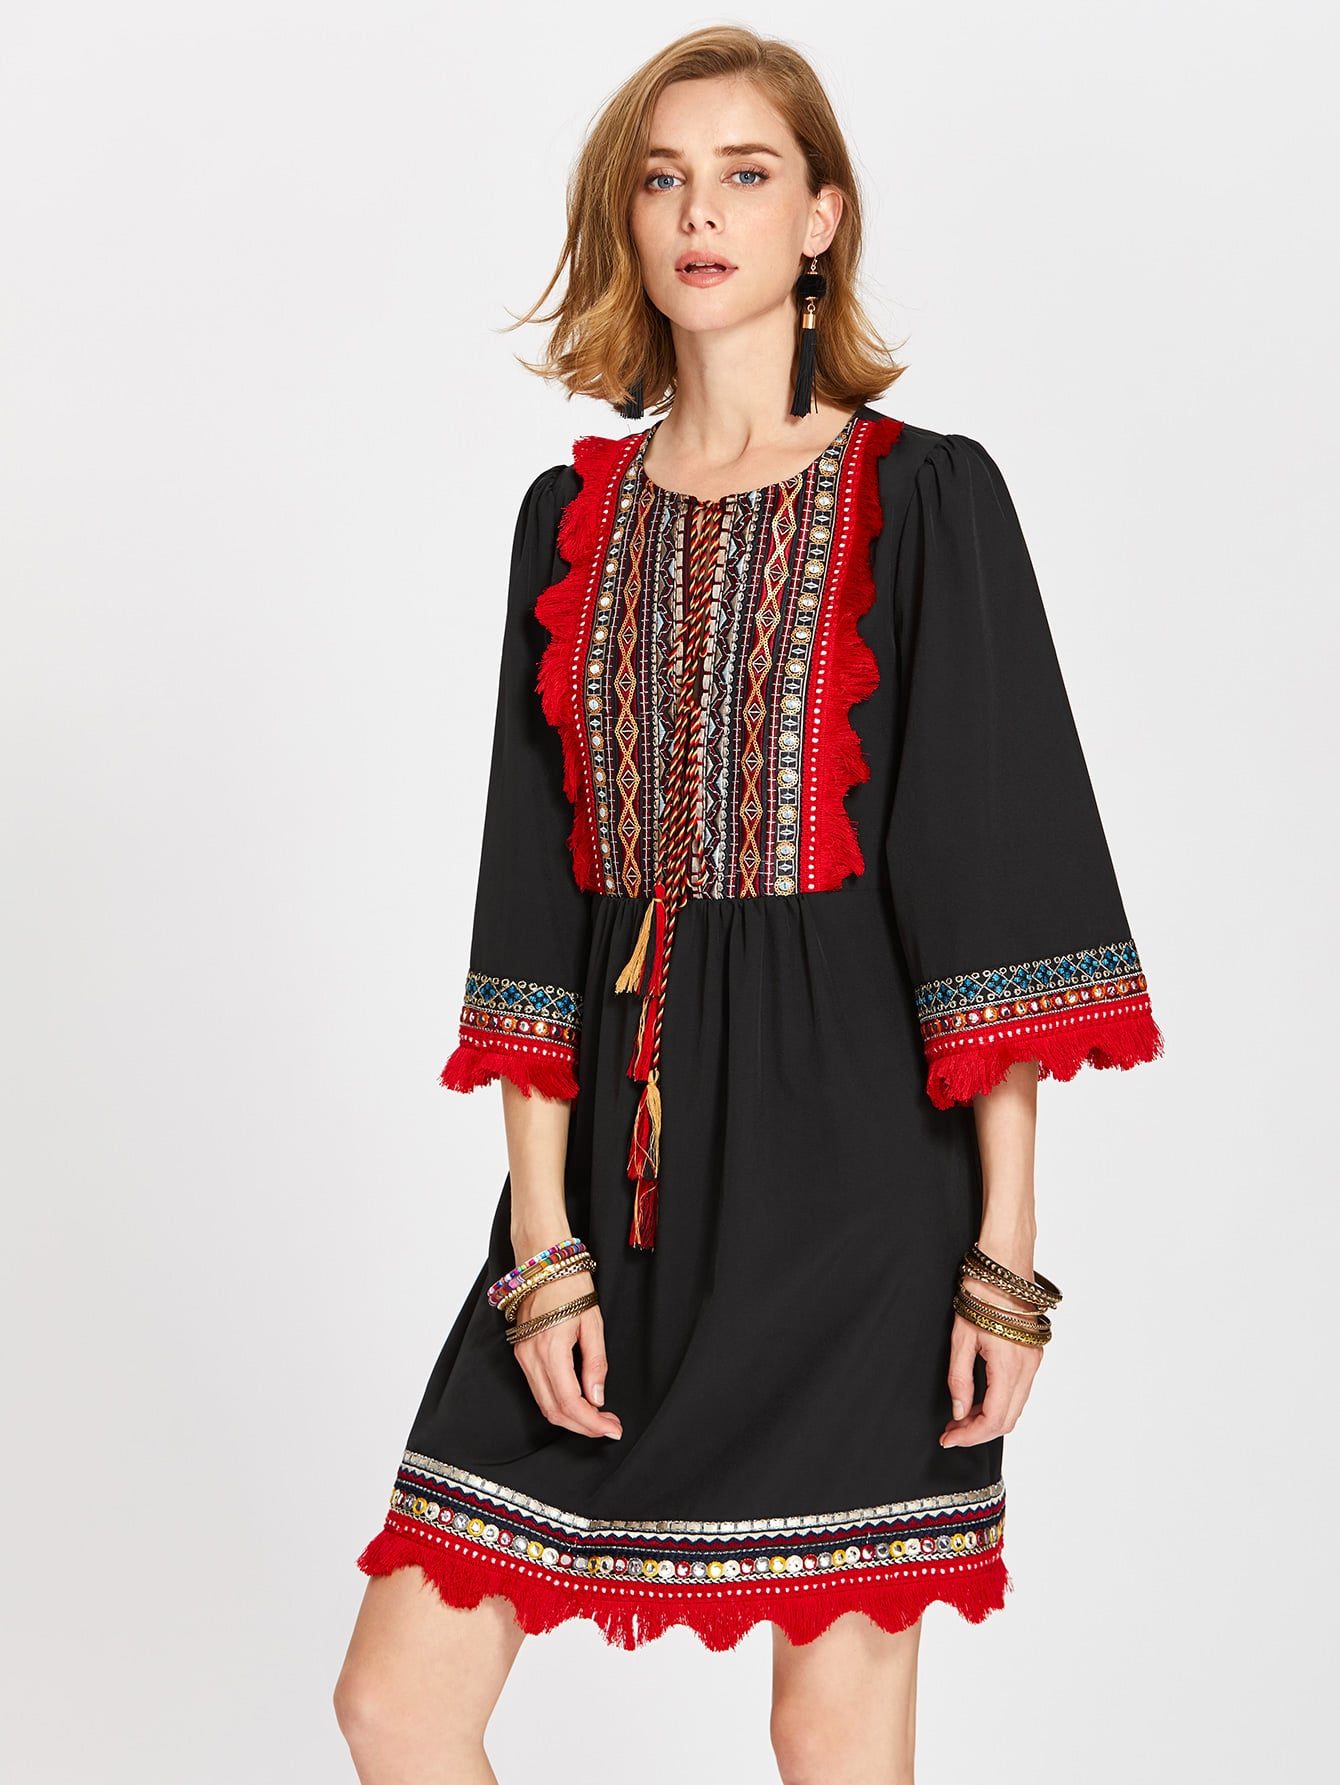 Фото Tasseled Tie Fringe Lace Trim Embroidery Detail Dress. Купить с доставкой